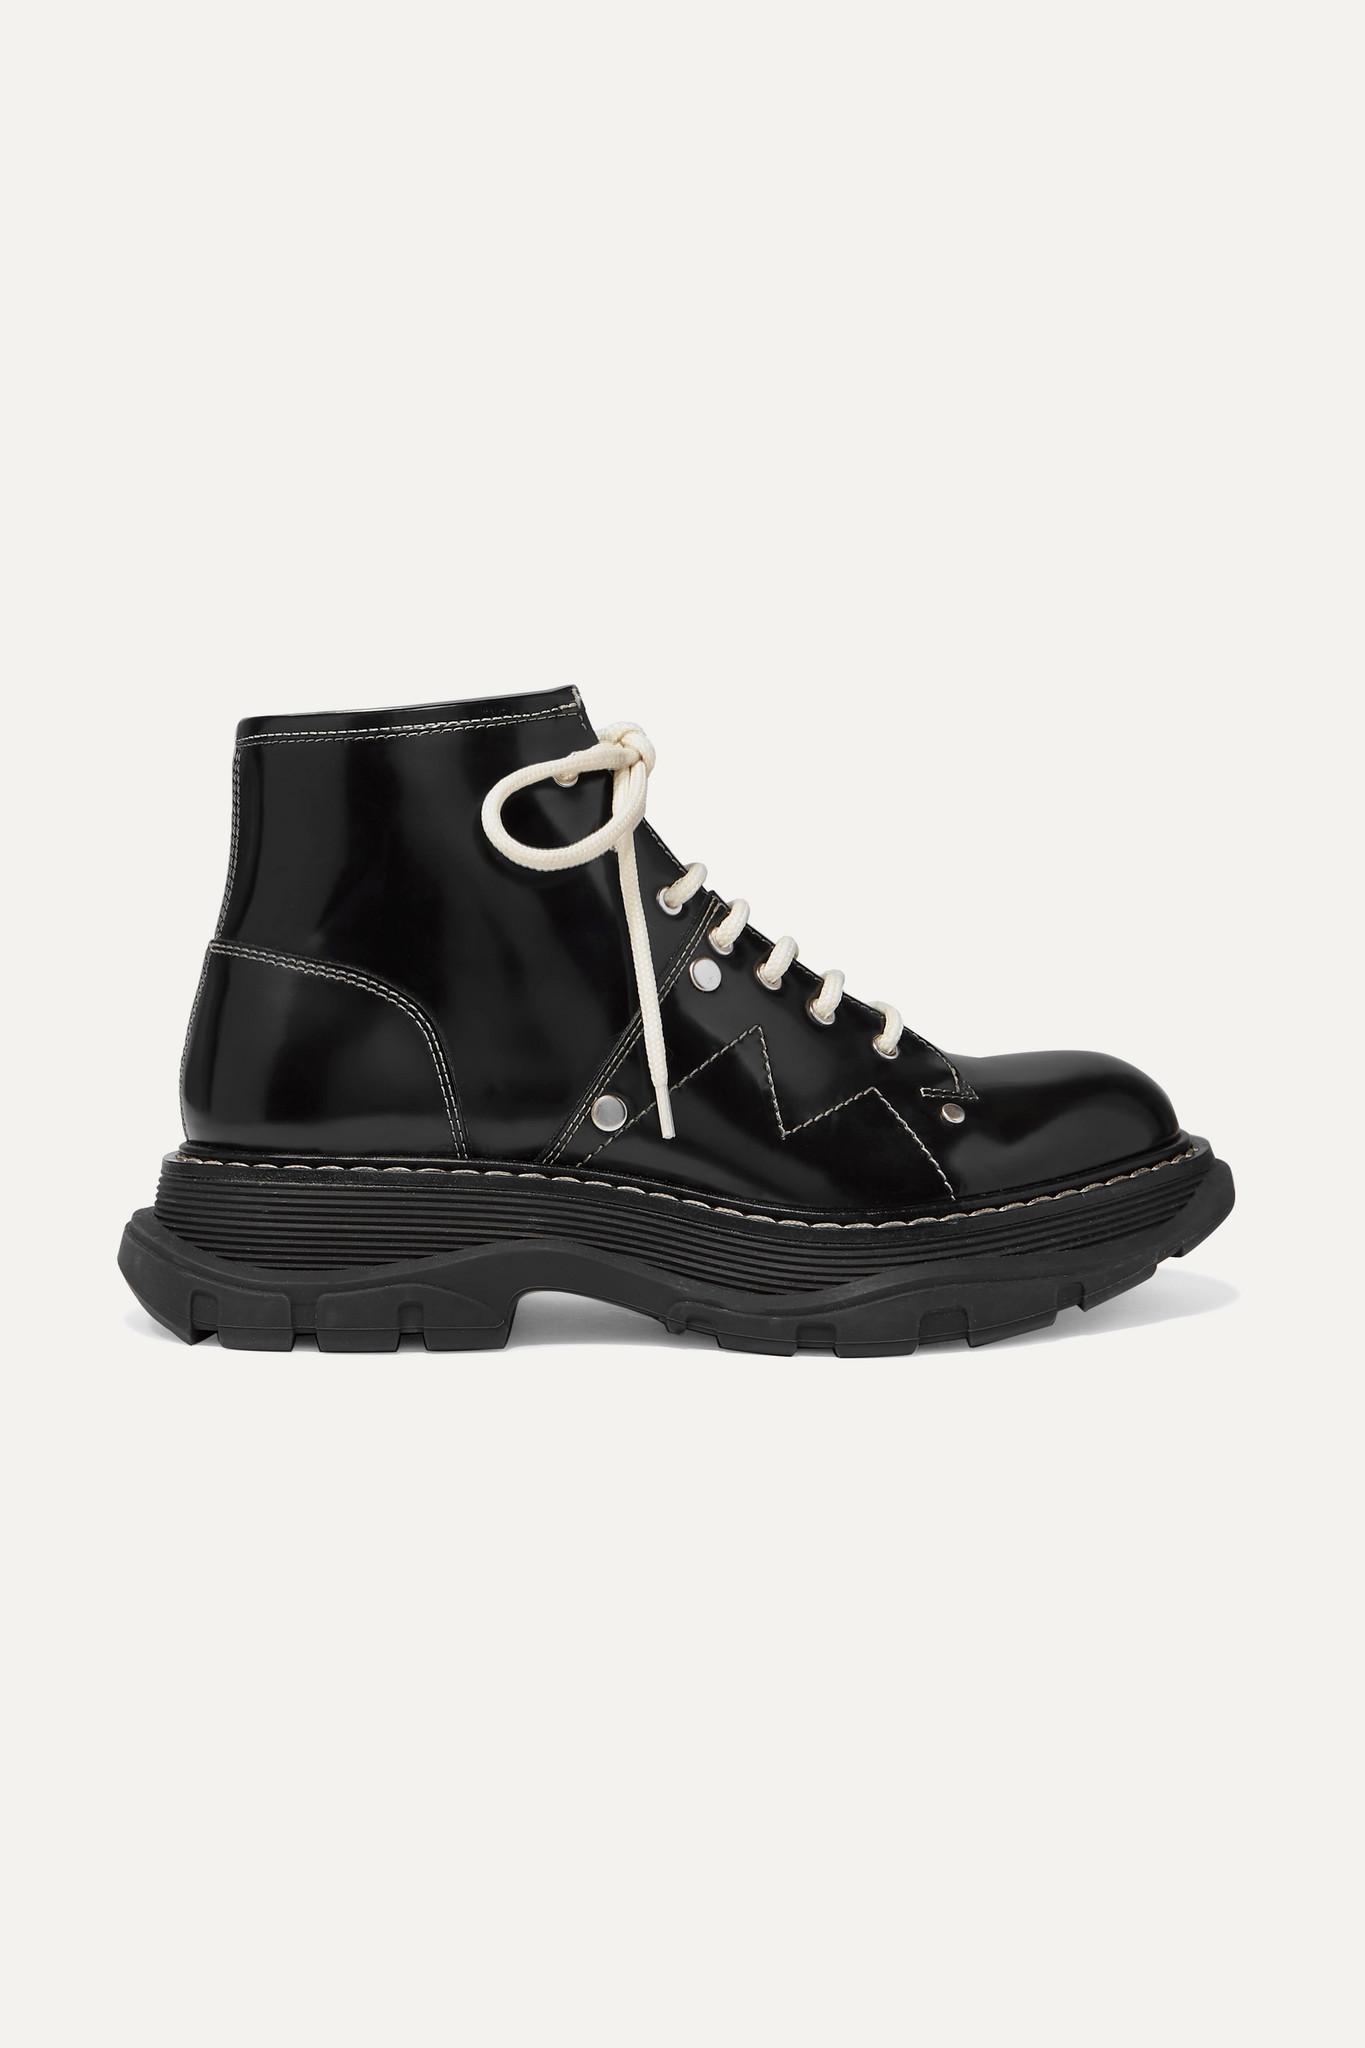 ALEXANDER MCQUEEN - 亮面皮革厚底踝靴 - 黑色 - IT40